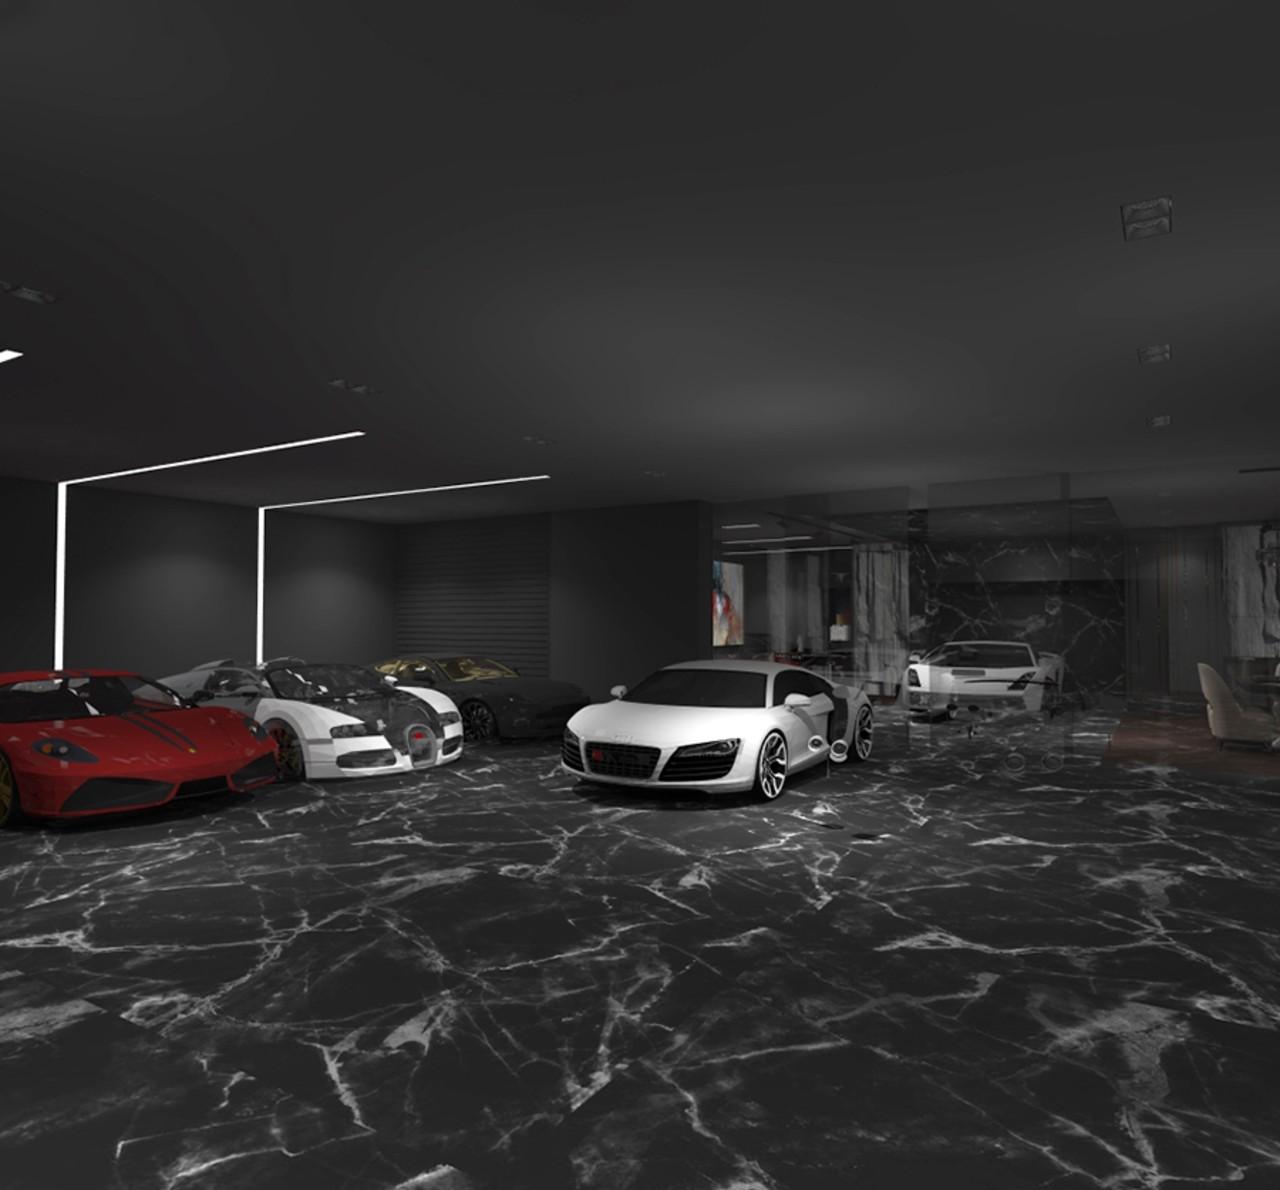 Garažo interjeras su automobiliais